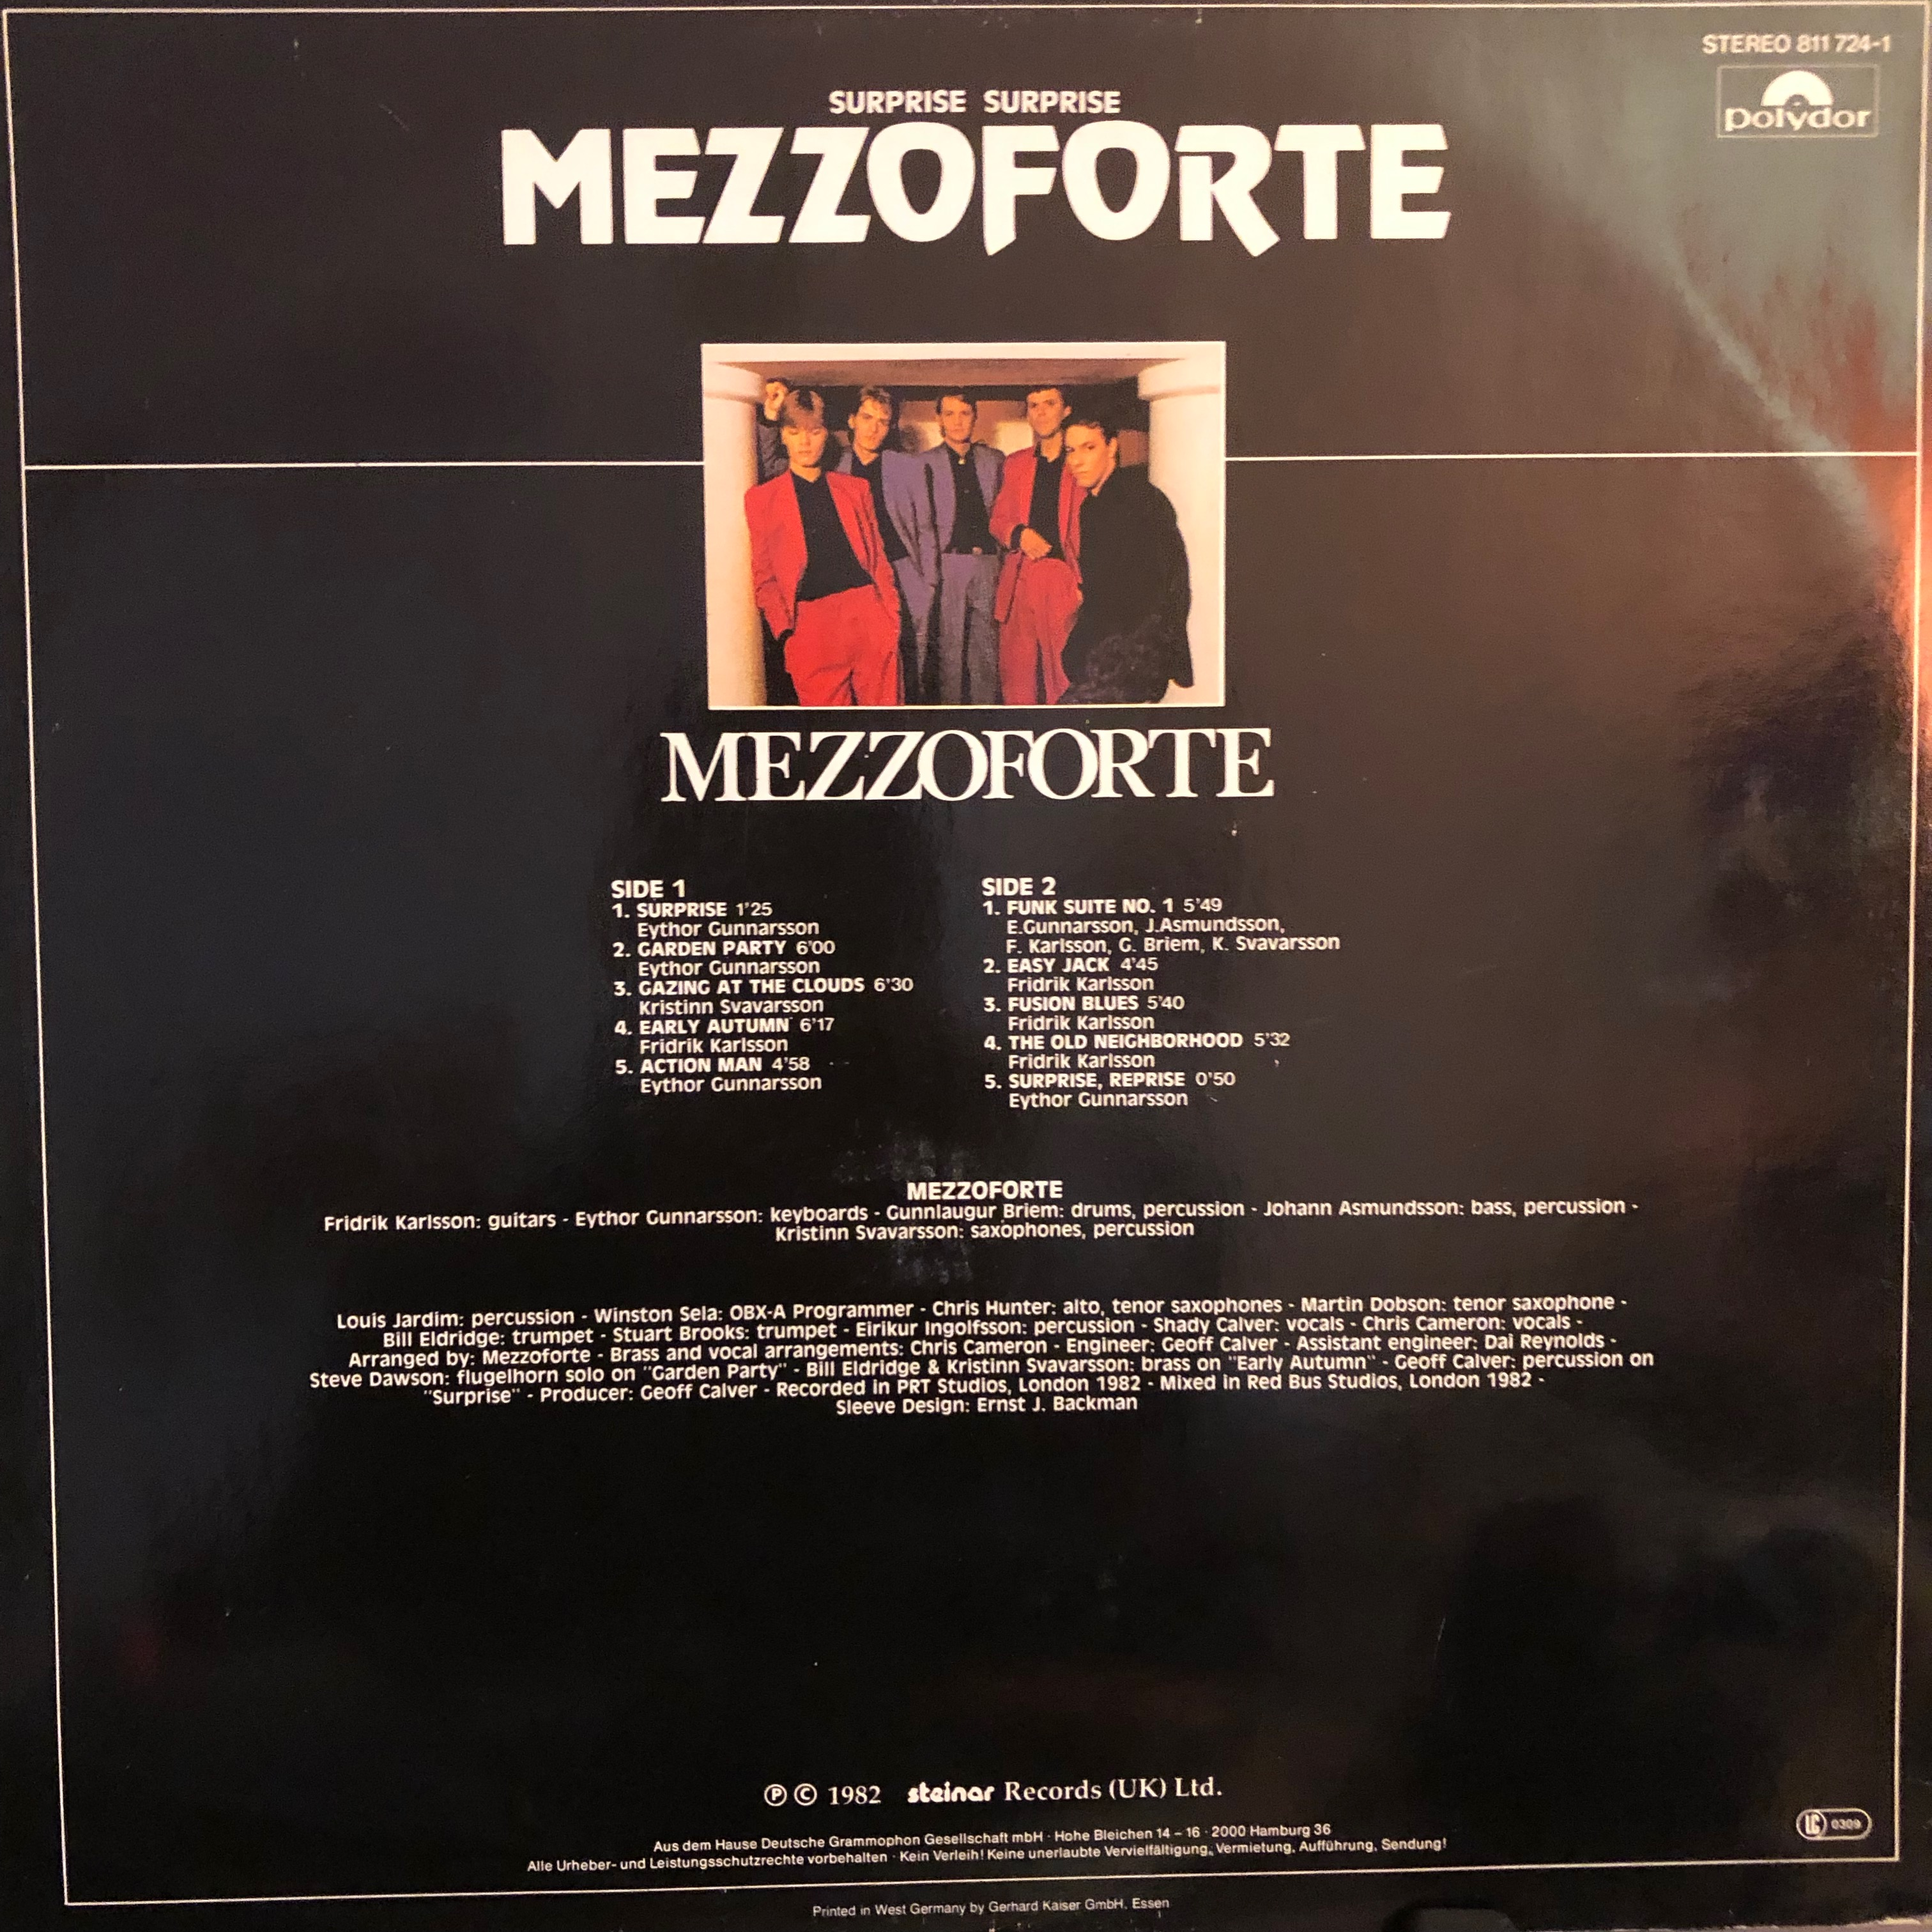 Mezzoforte - Surprise Surprise - Back Cover